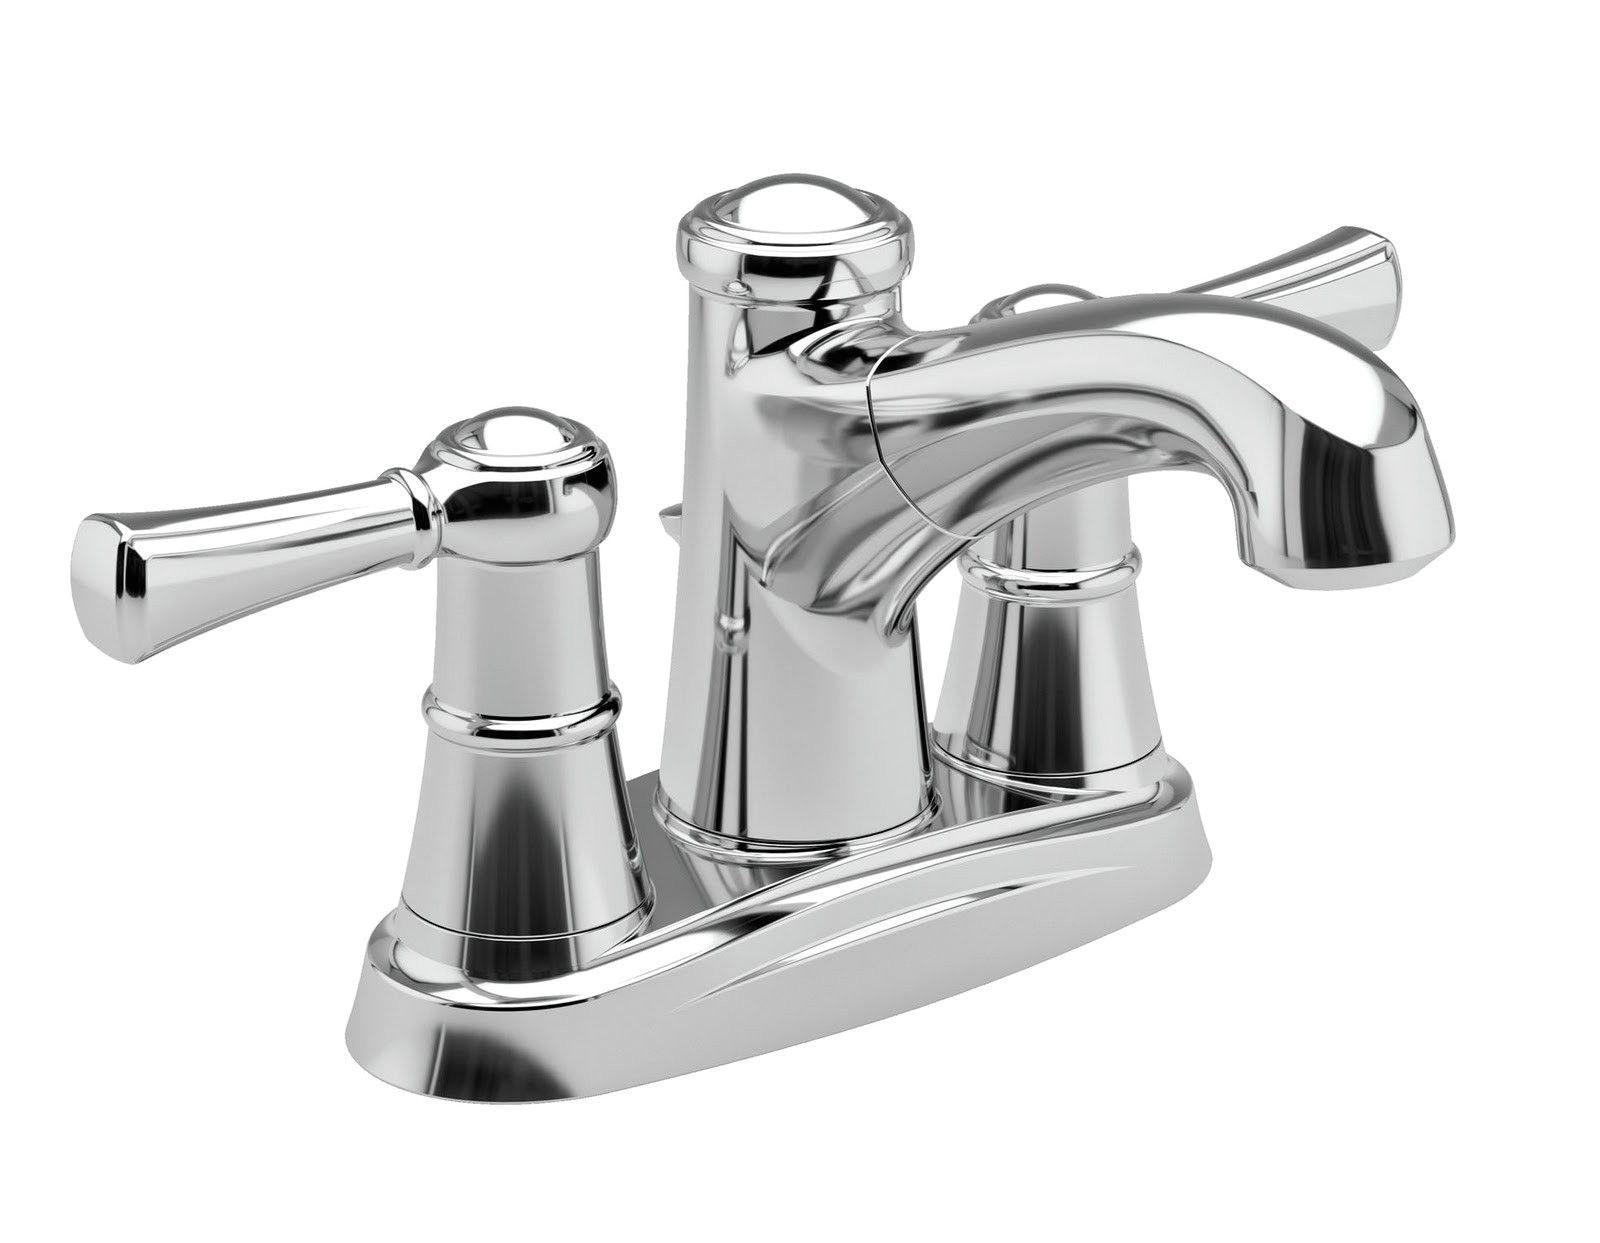 Home Depot Shower Knobs Inspirational Bathroom Faucet Home Depot